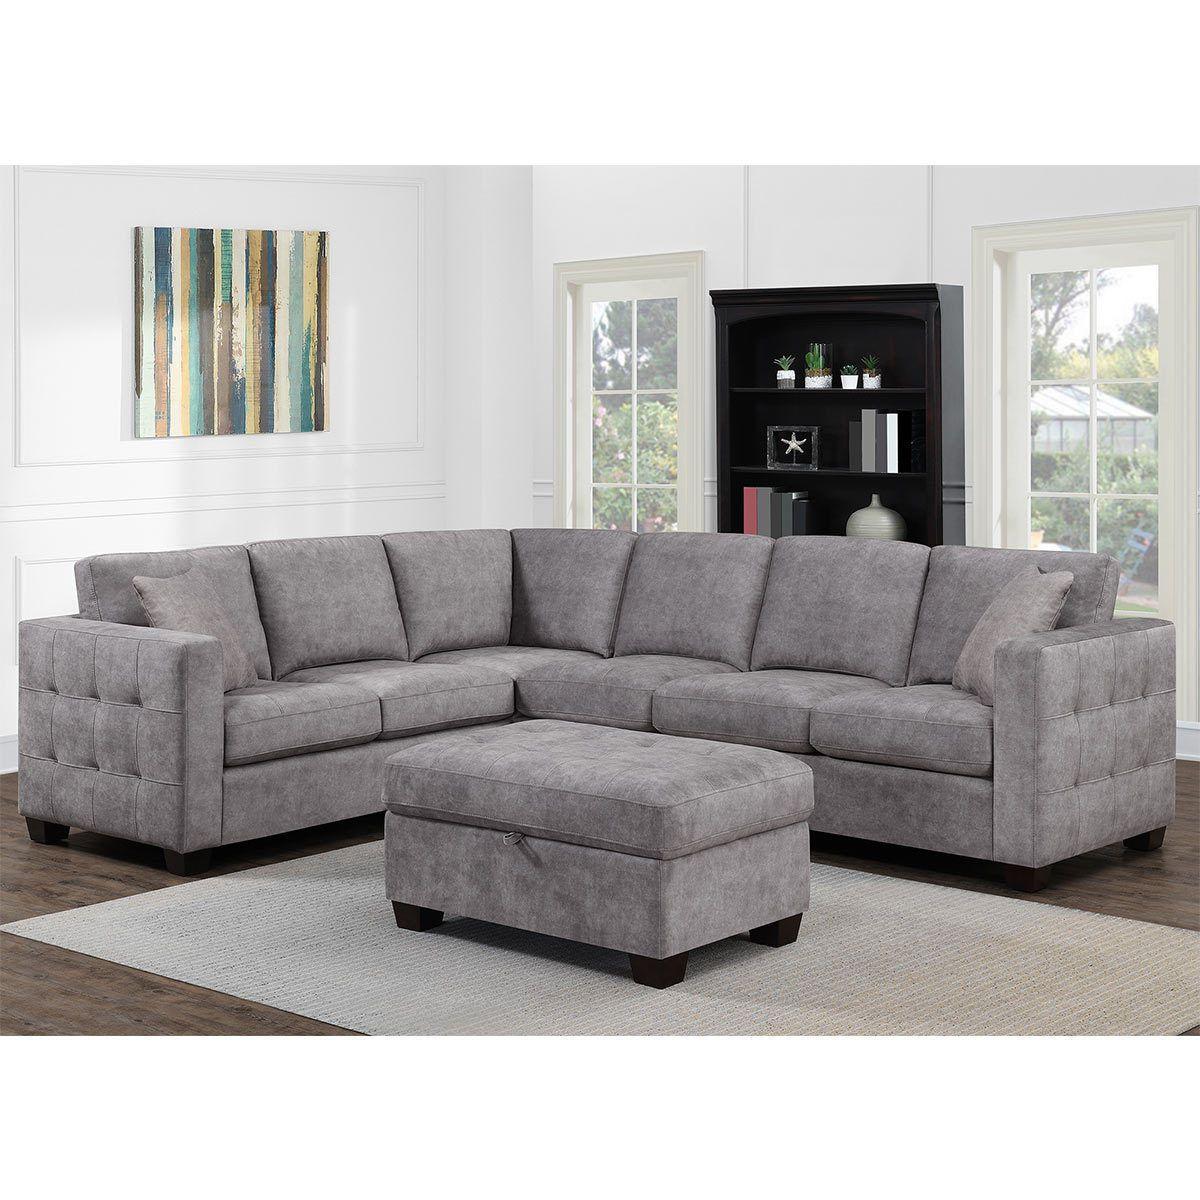 Thomasville Kylie Grey Fabric Corner Sofa With Storage Ottoman